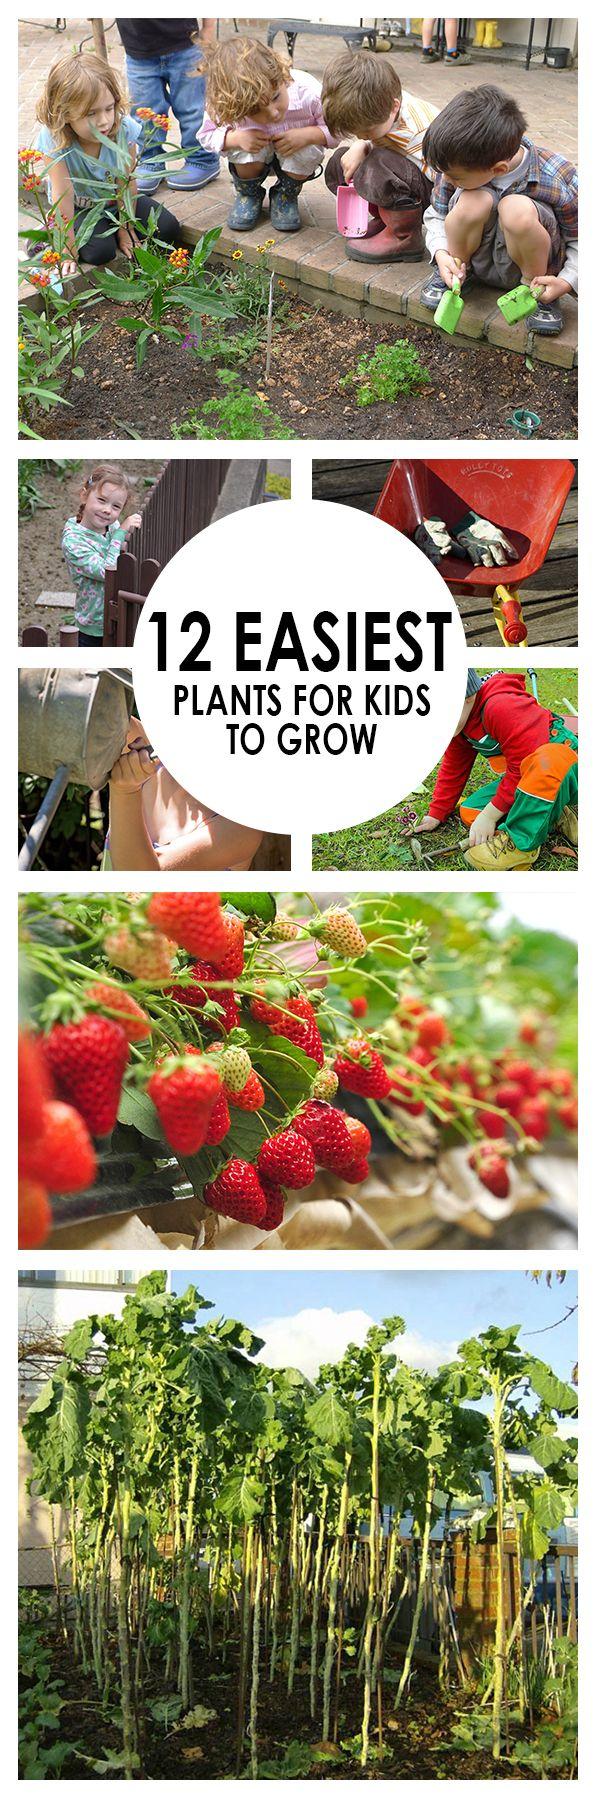 12 Easiest Plants for Kids to Grow | Gardening hacks